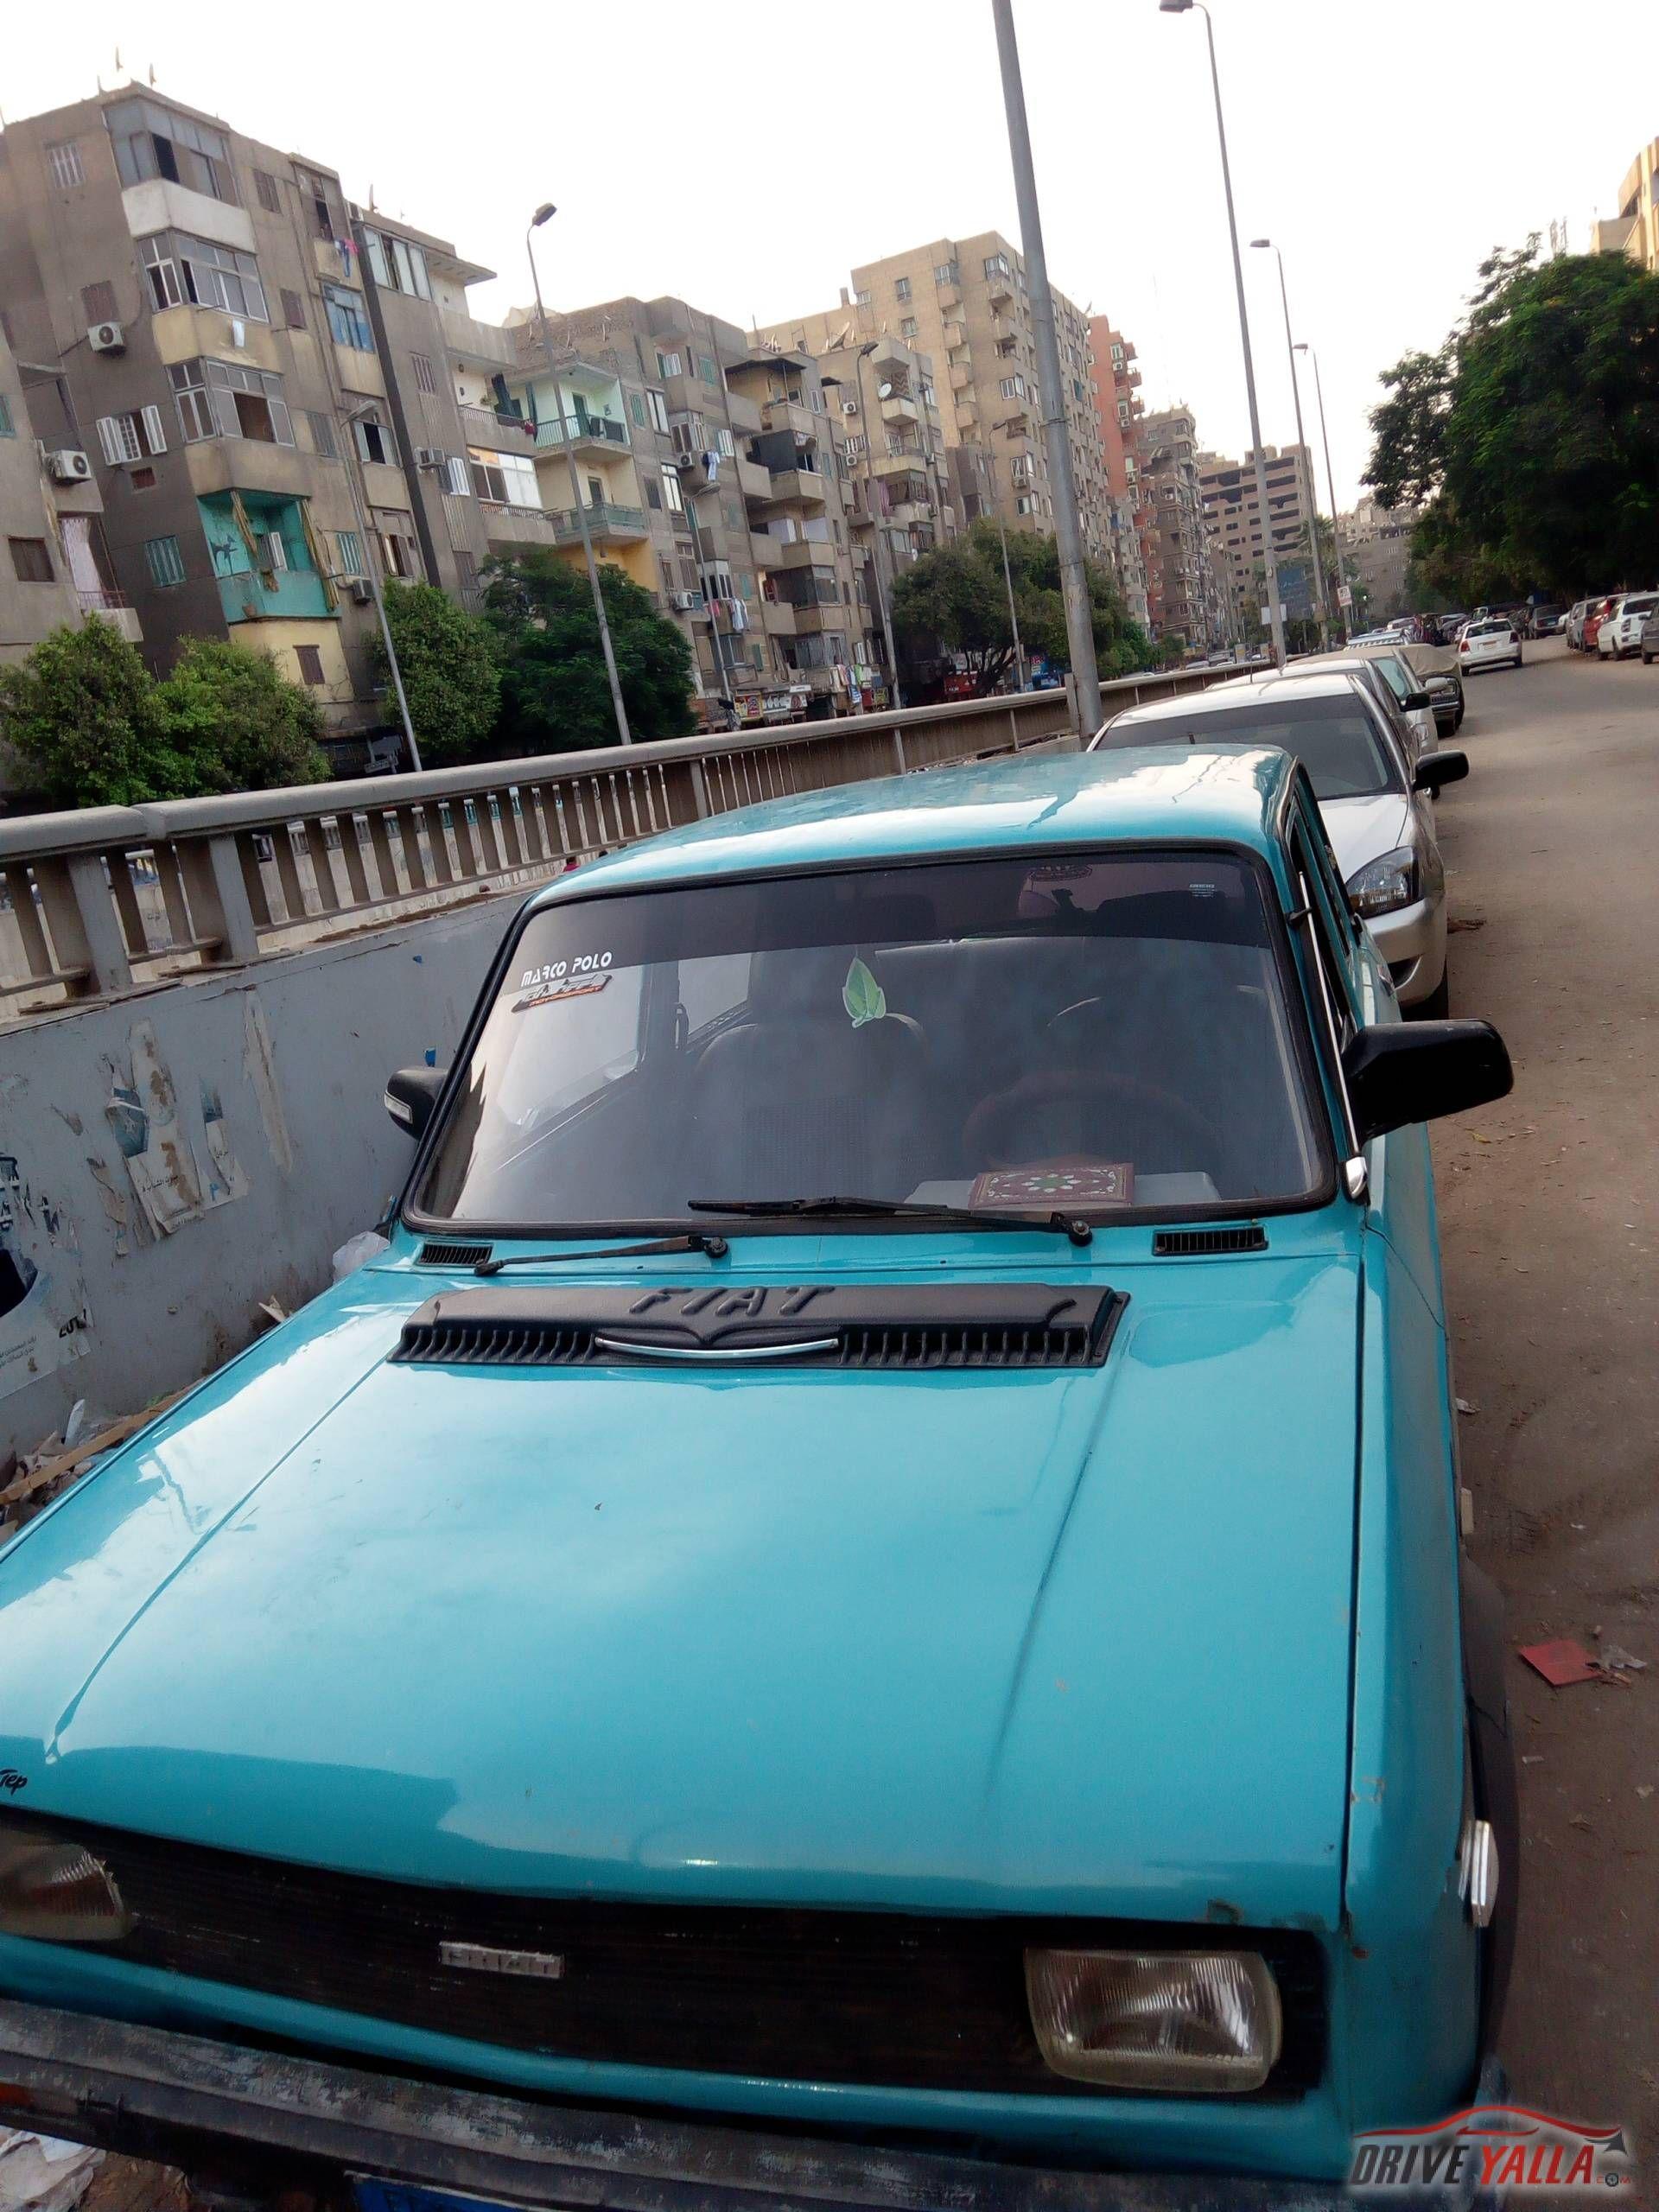 عربيه ١٢٨ بحاله ممتازه Bmw Car Bmw Car